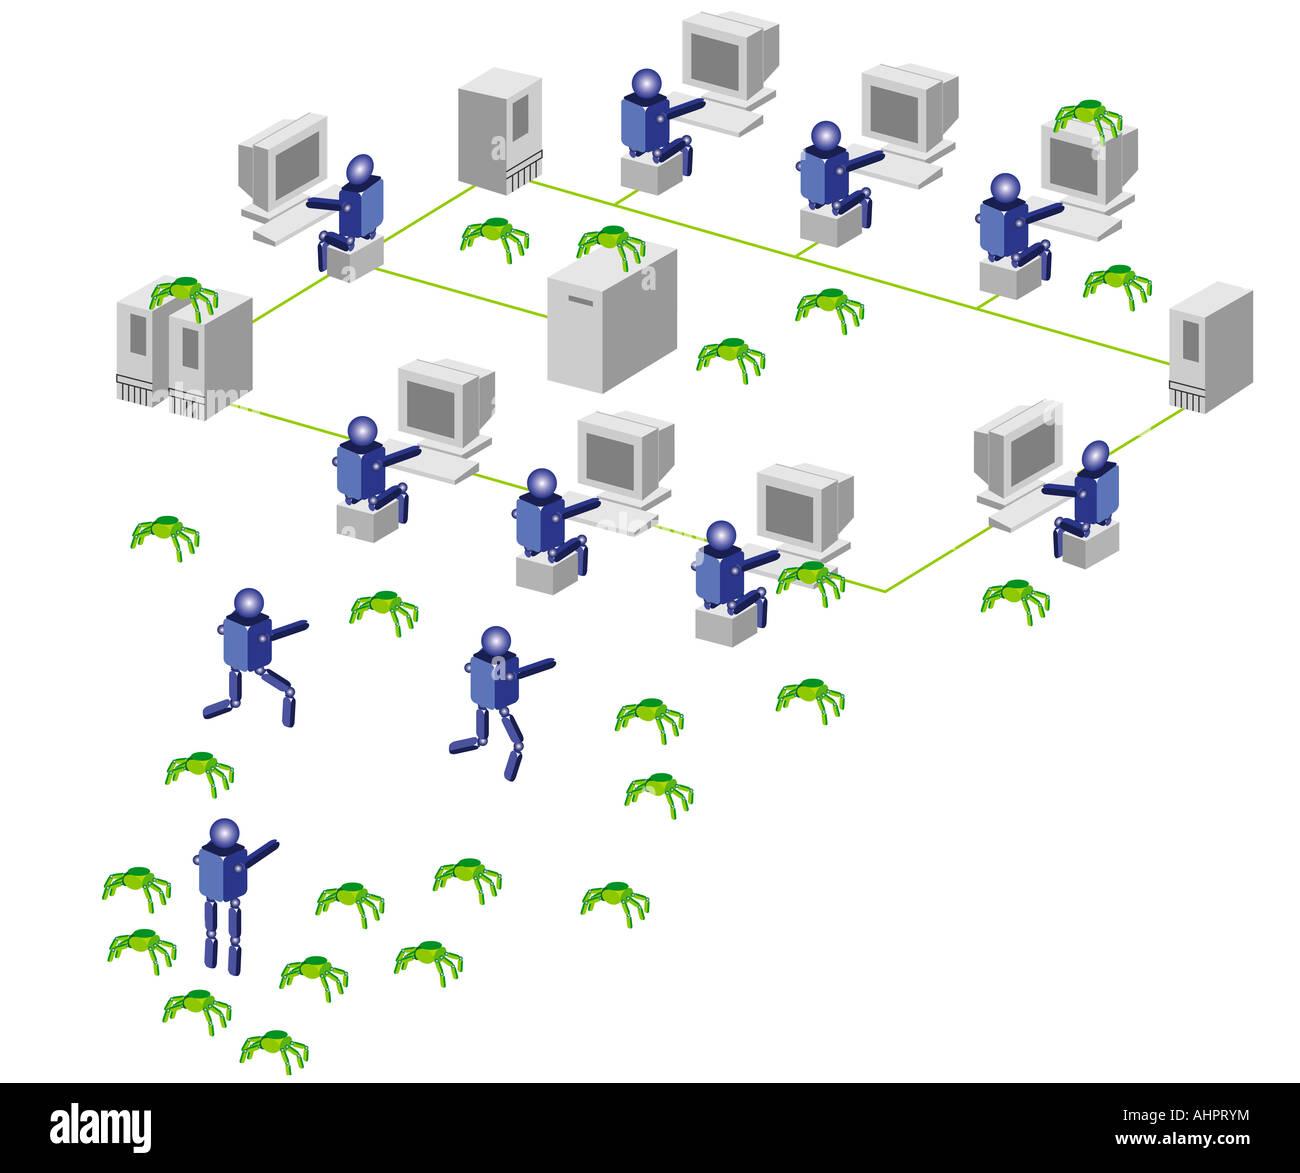 hight resolution of computer network digital illustration stock image